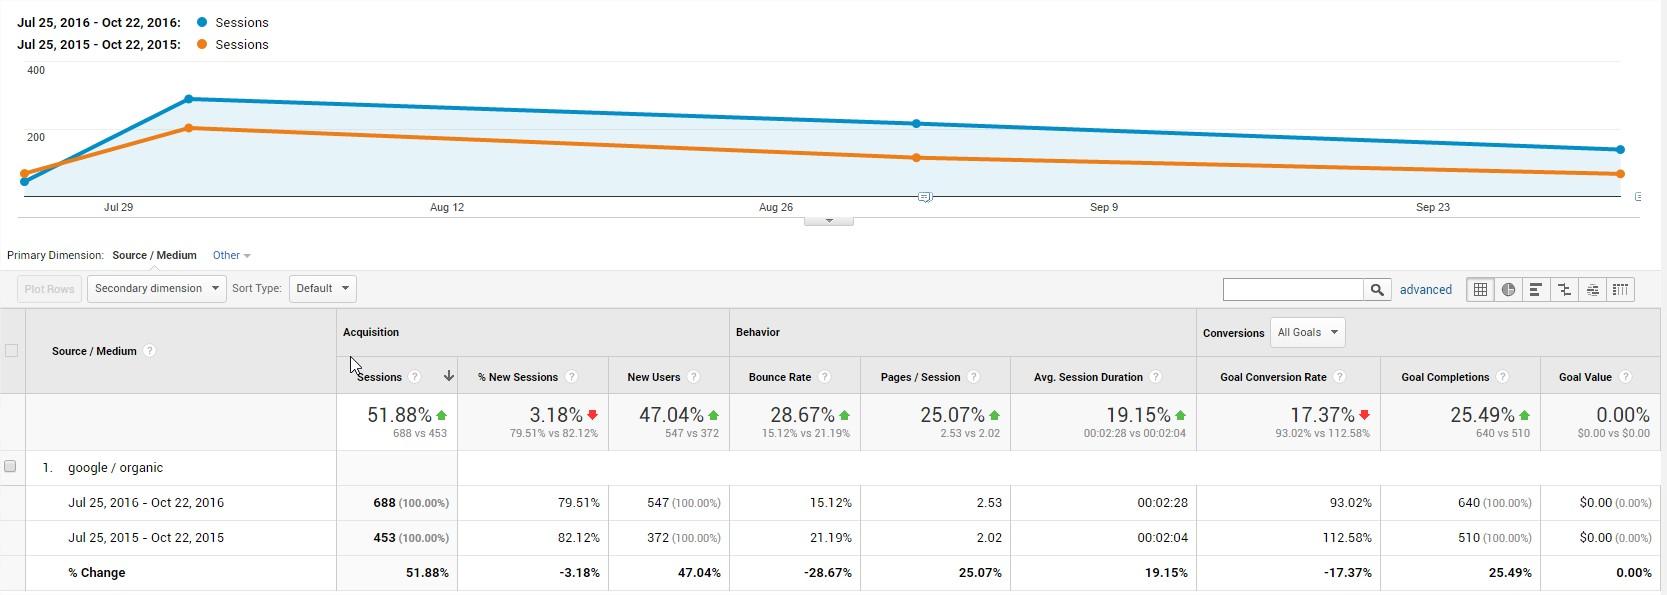 Google Analytics year over year graph 90 days